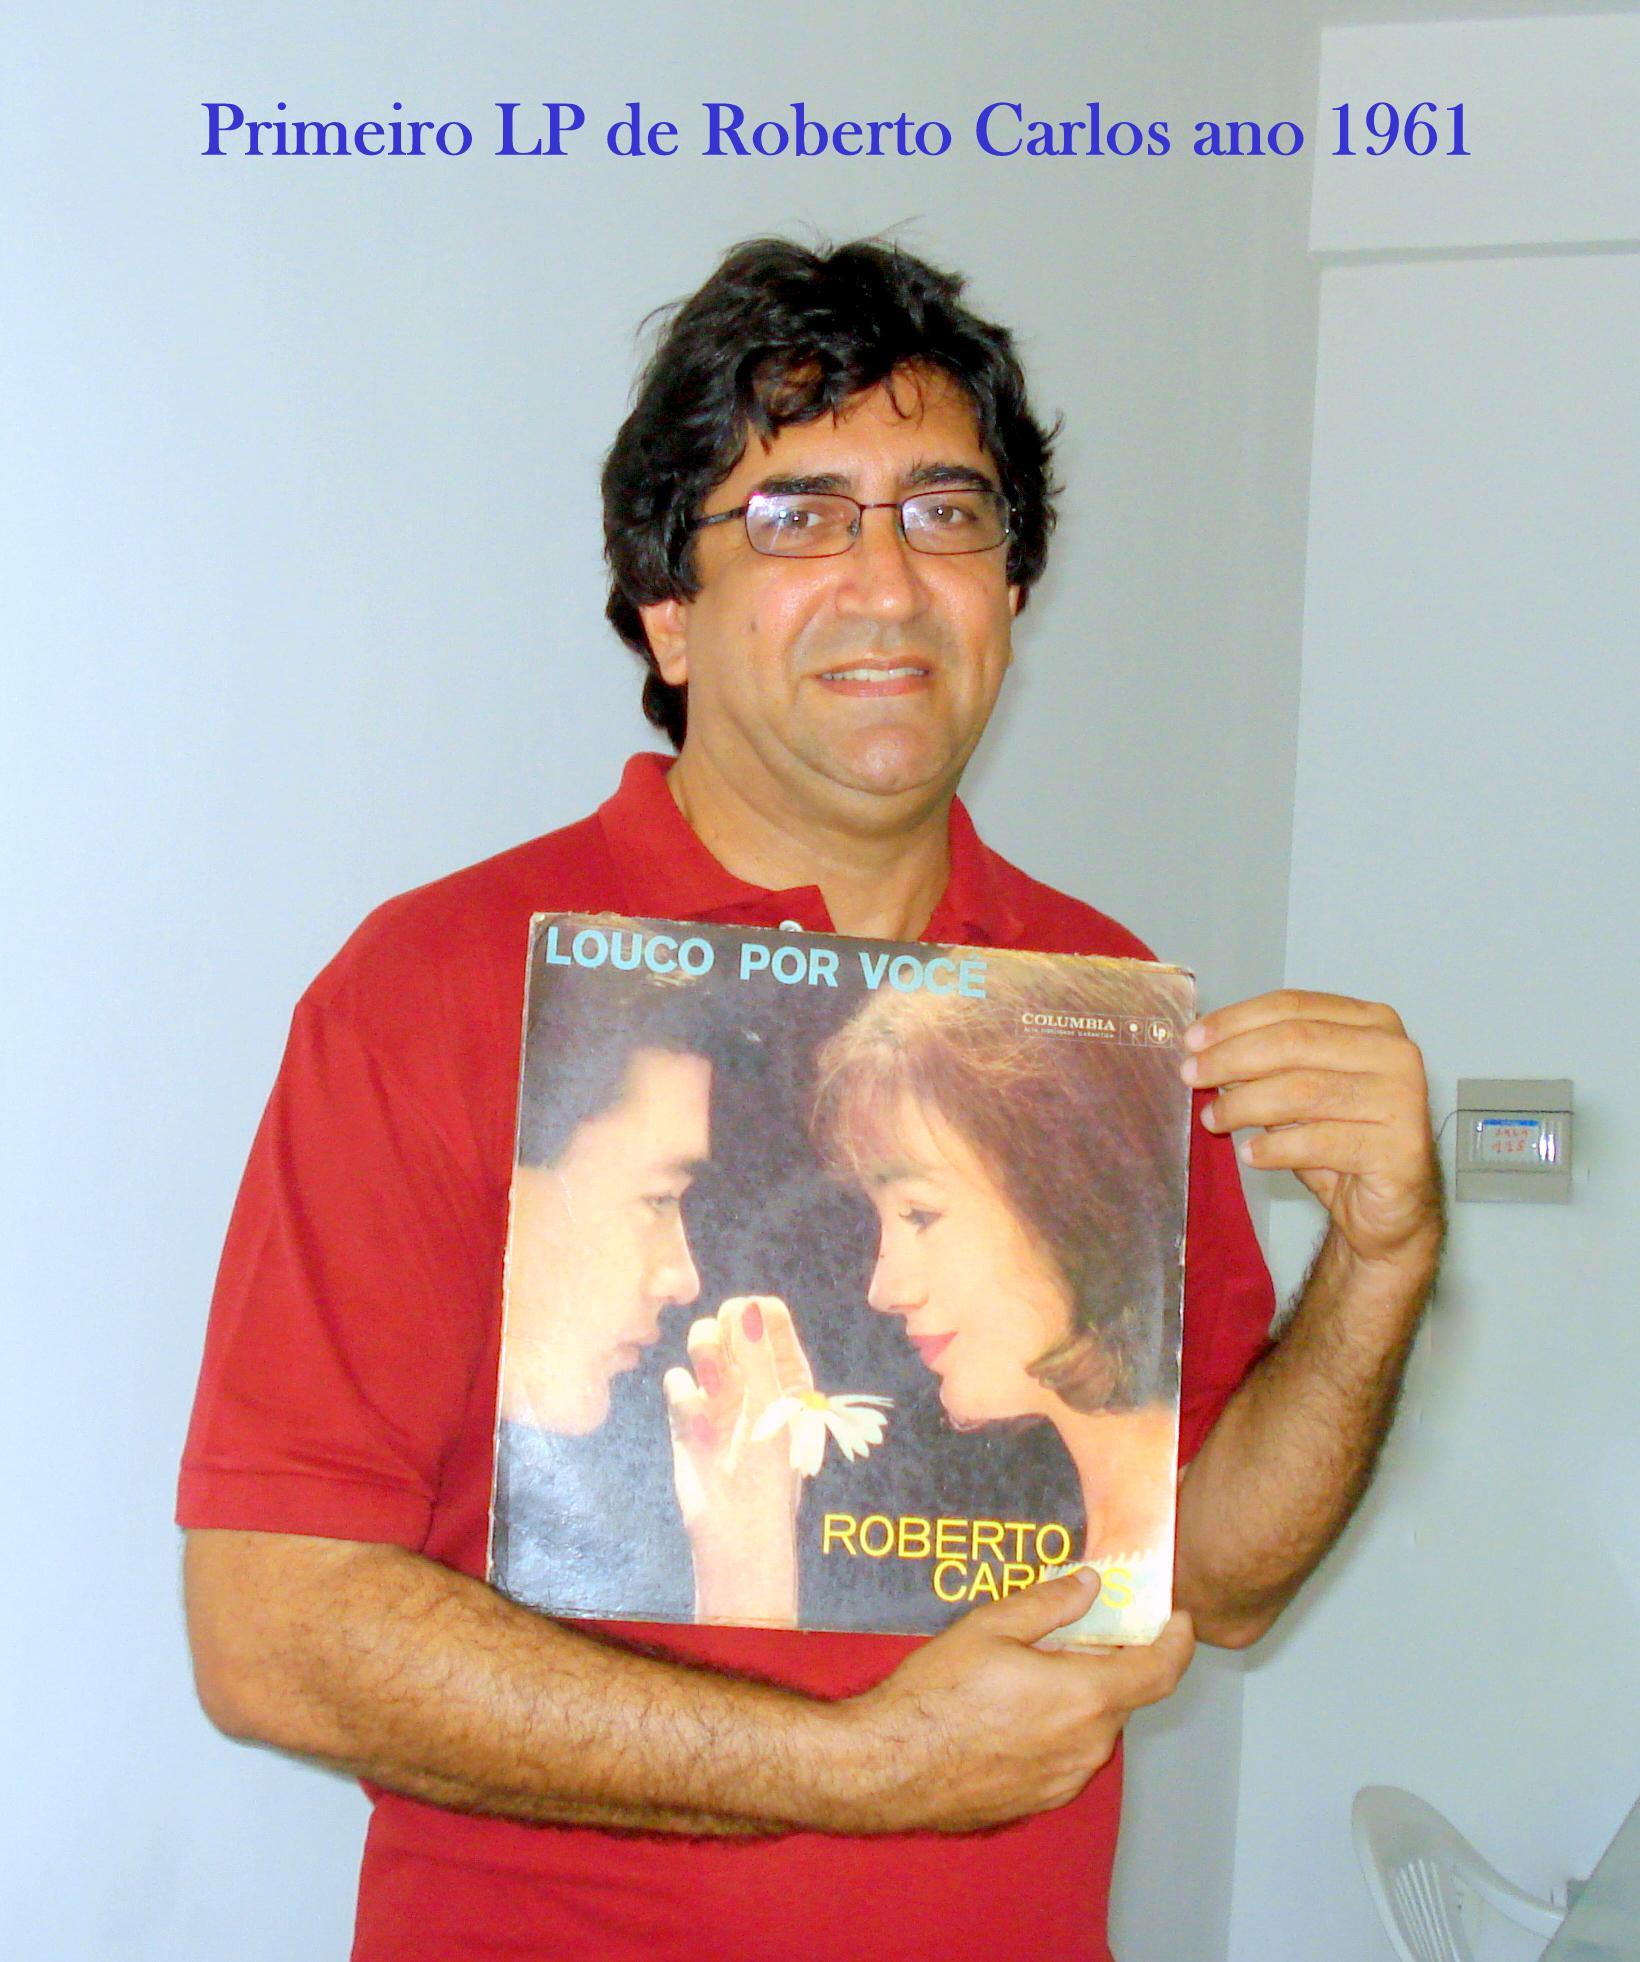 Eli Gomes de Araujo. - Primeiro LP de Roberto Carlos lançado em 1961.